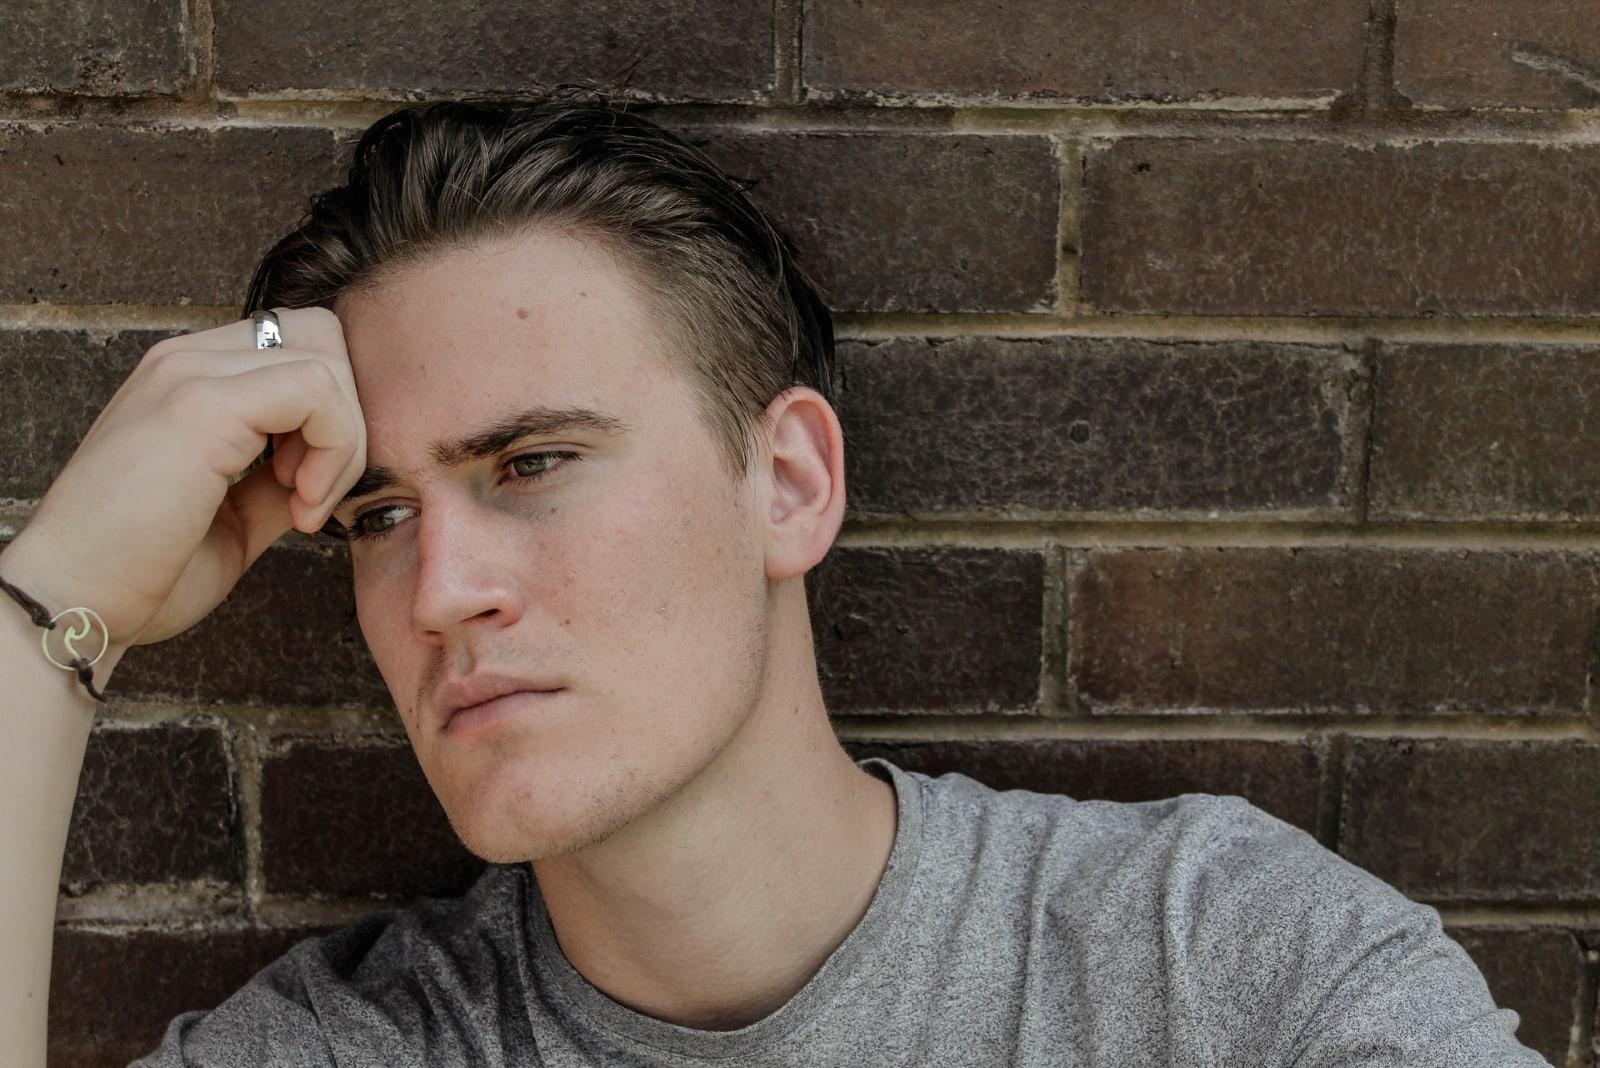 sad man in gray shirt sitting near wall